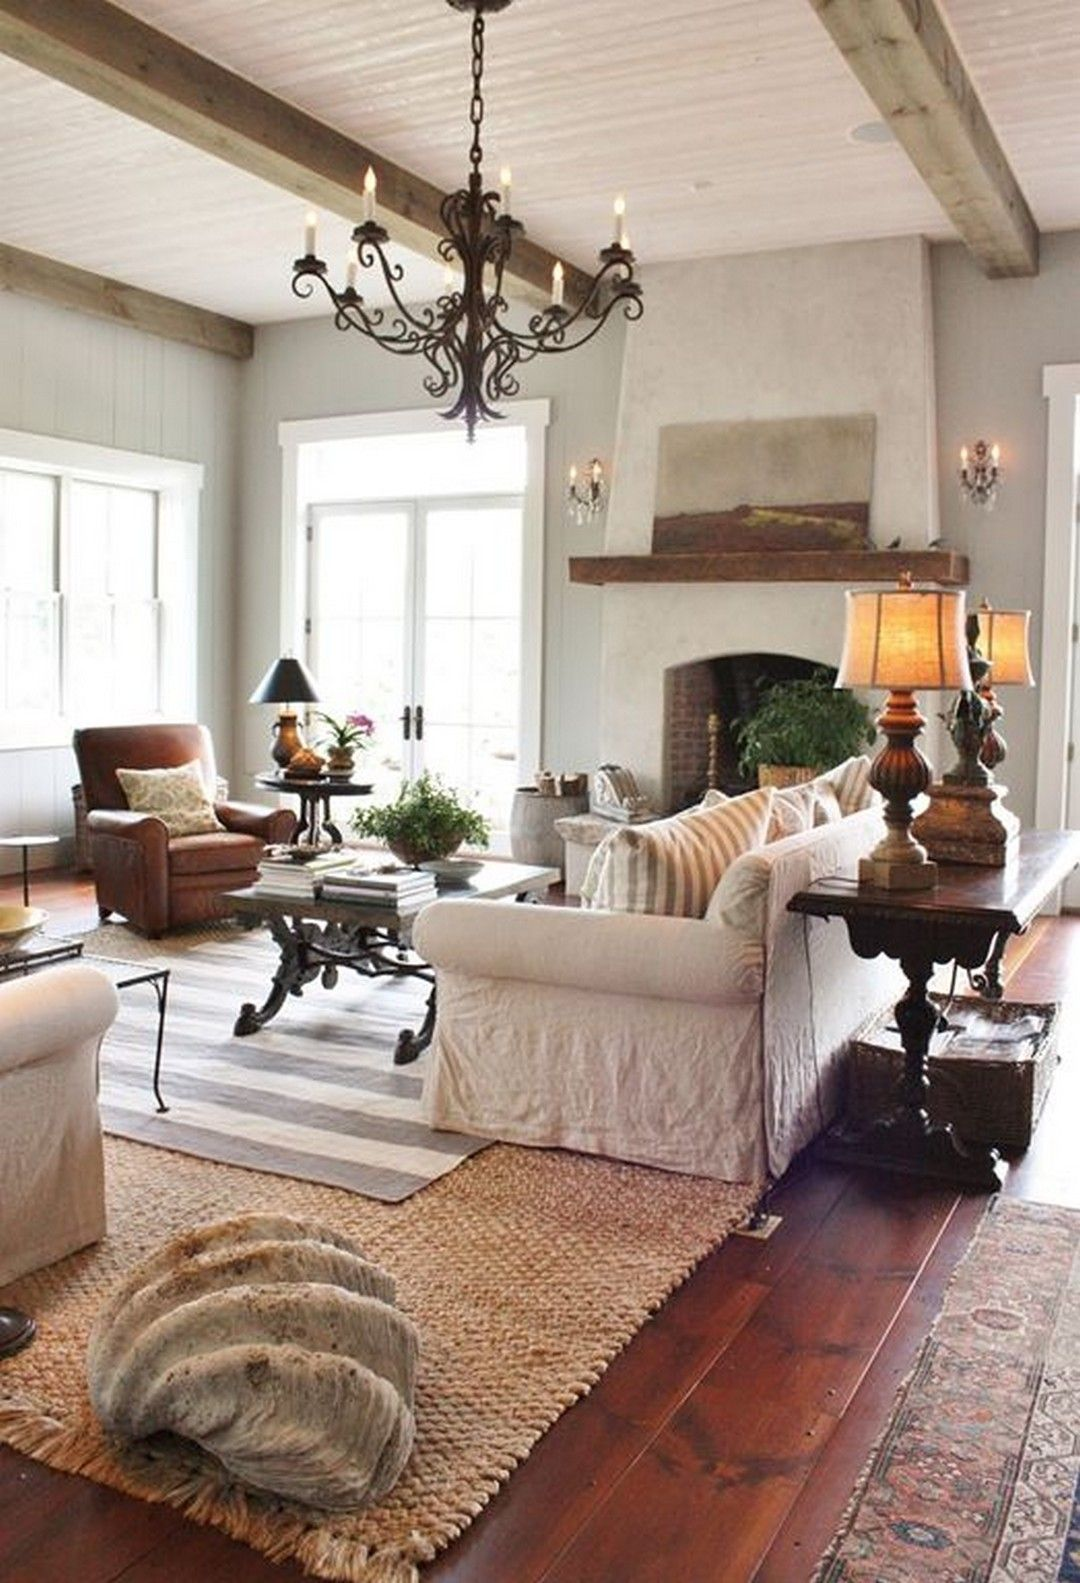 Spanish Farmhouse Design 99 Inpiration Photos 99architecture Mediterranean Living Rooms Living Room Interior Home Decor #spanish #decor #living #room